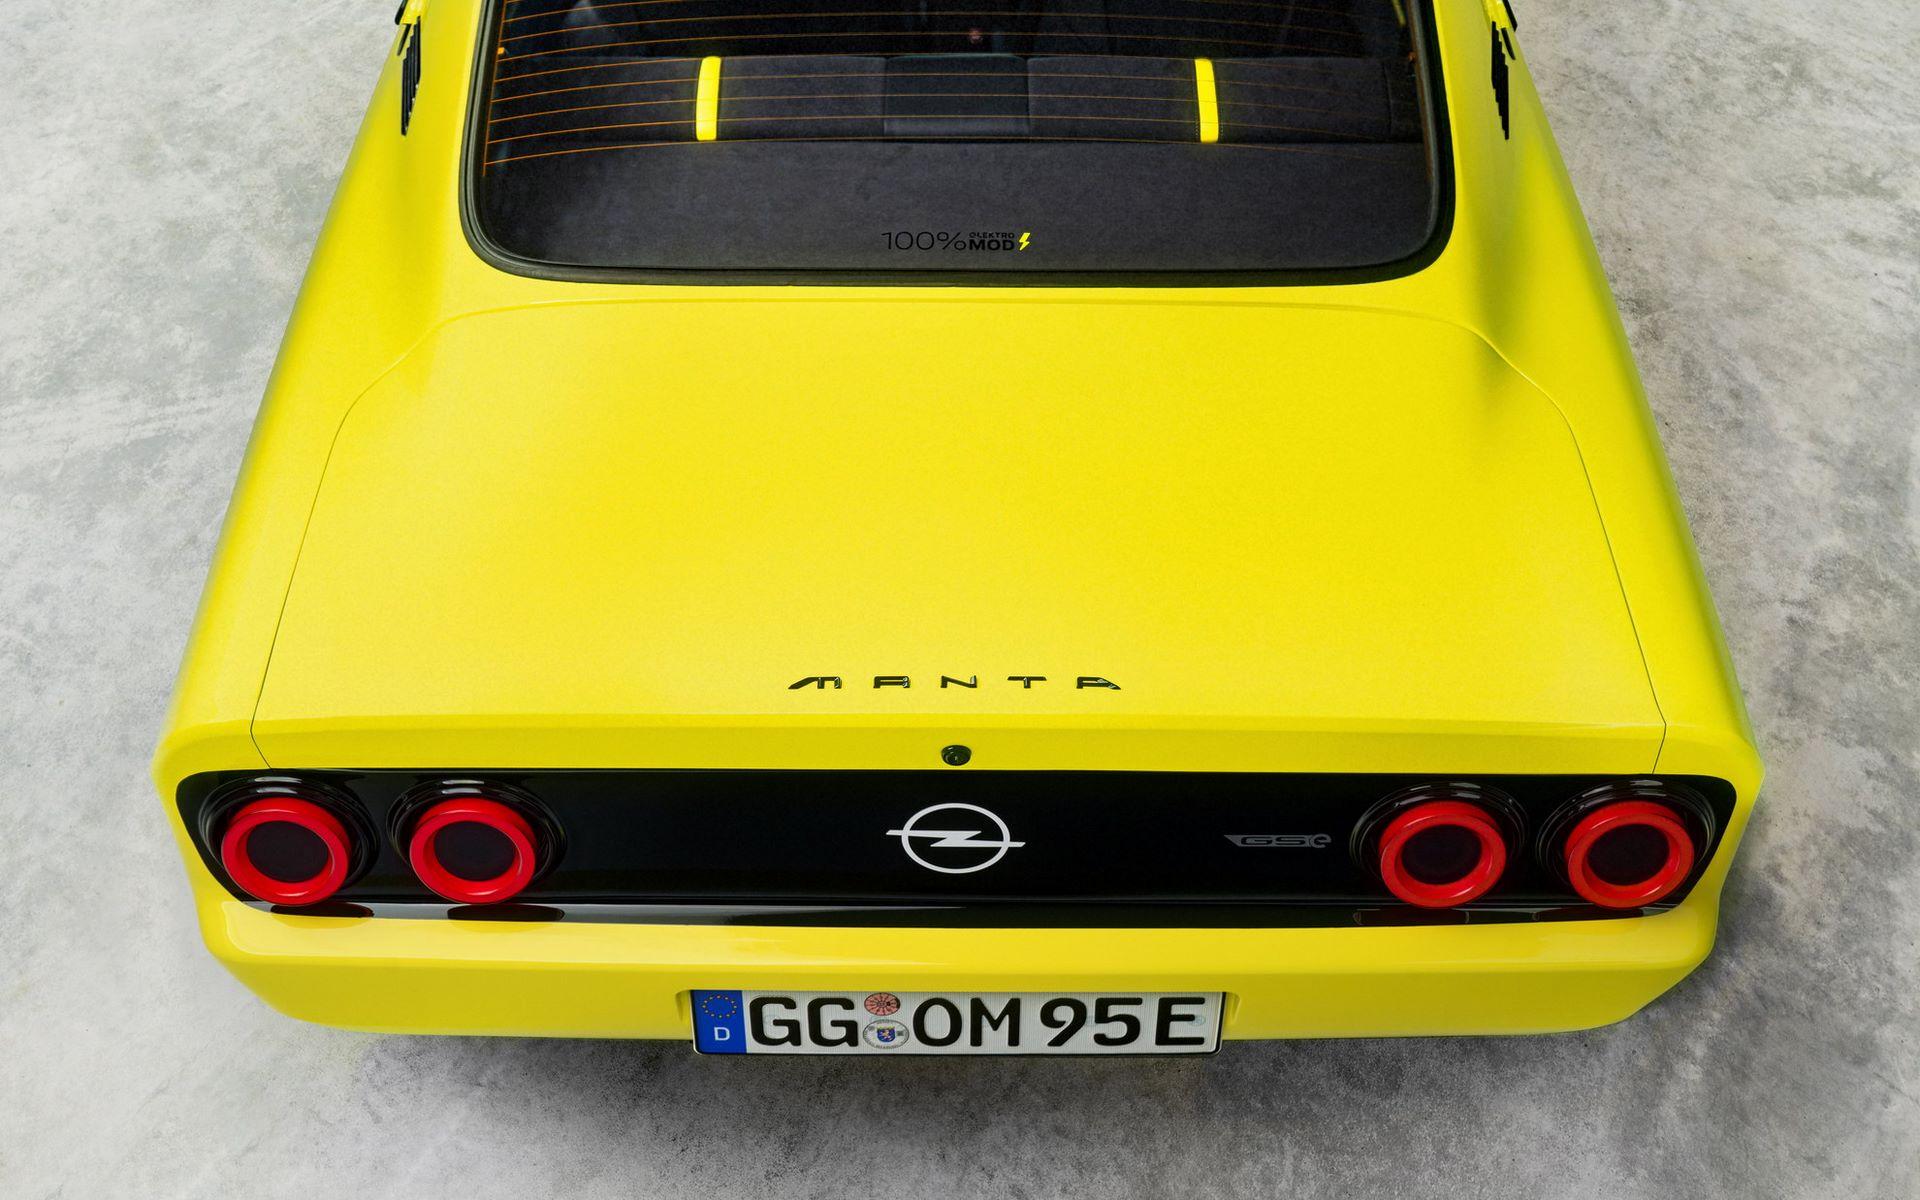 Opel-Manta-GSe-ElektroMOD-8